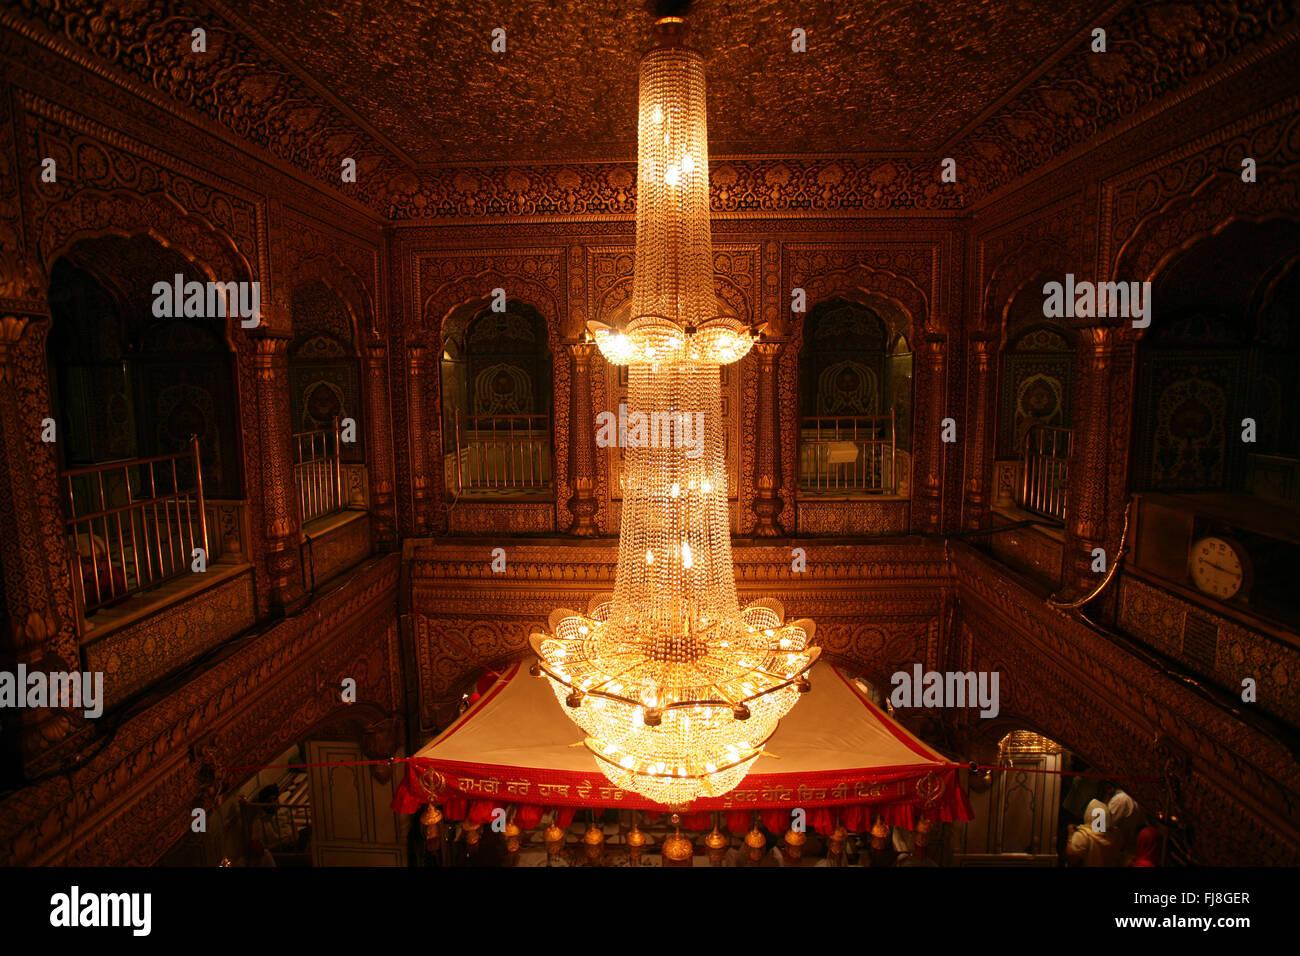 Coole Dekoration Kronleuchter In Indien - Design